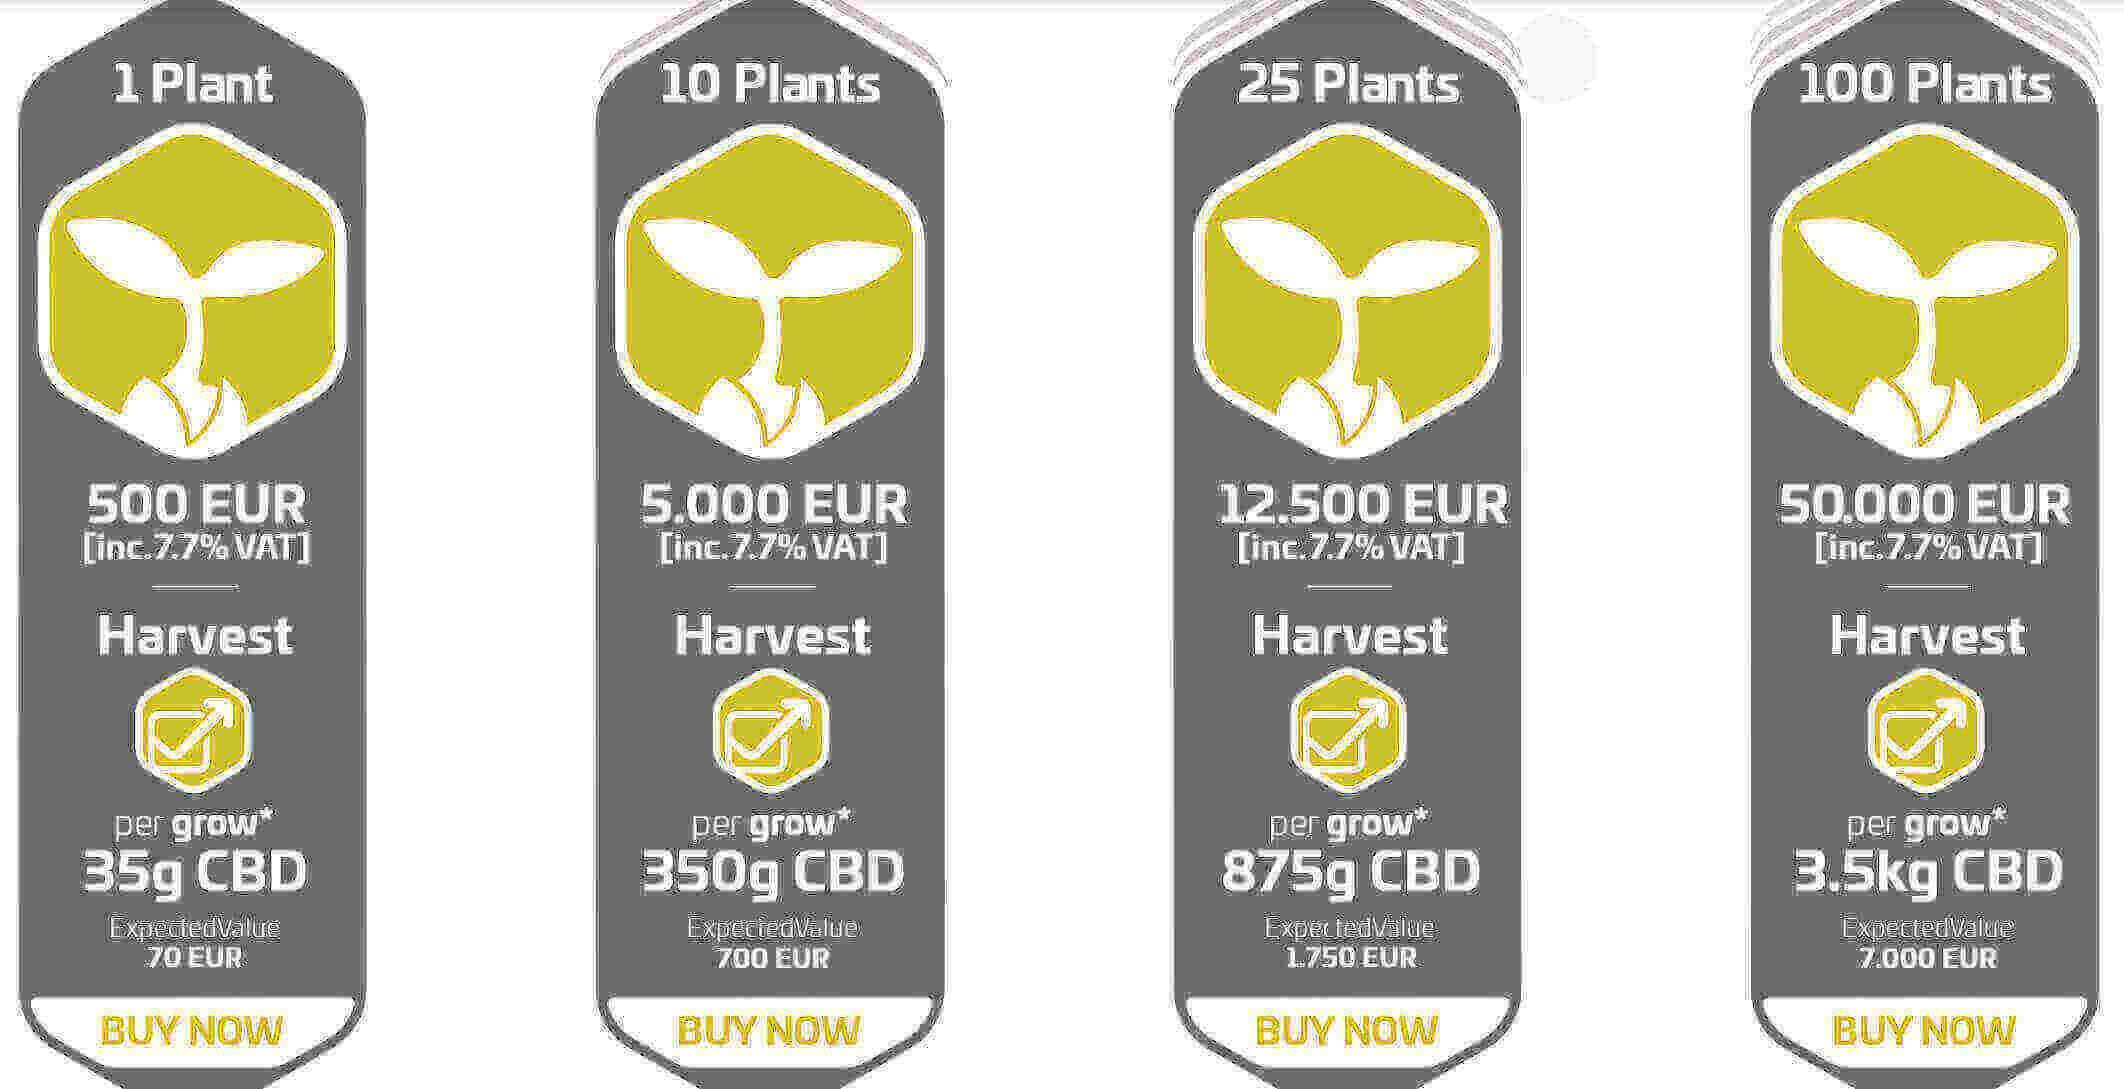 cannergrow plant sale